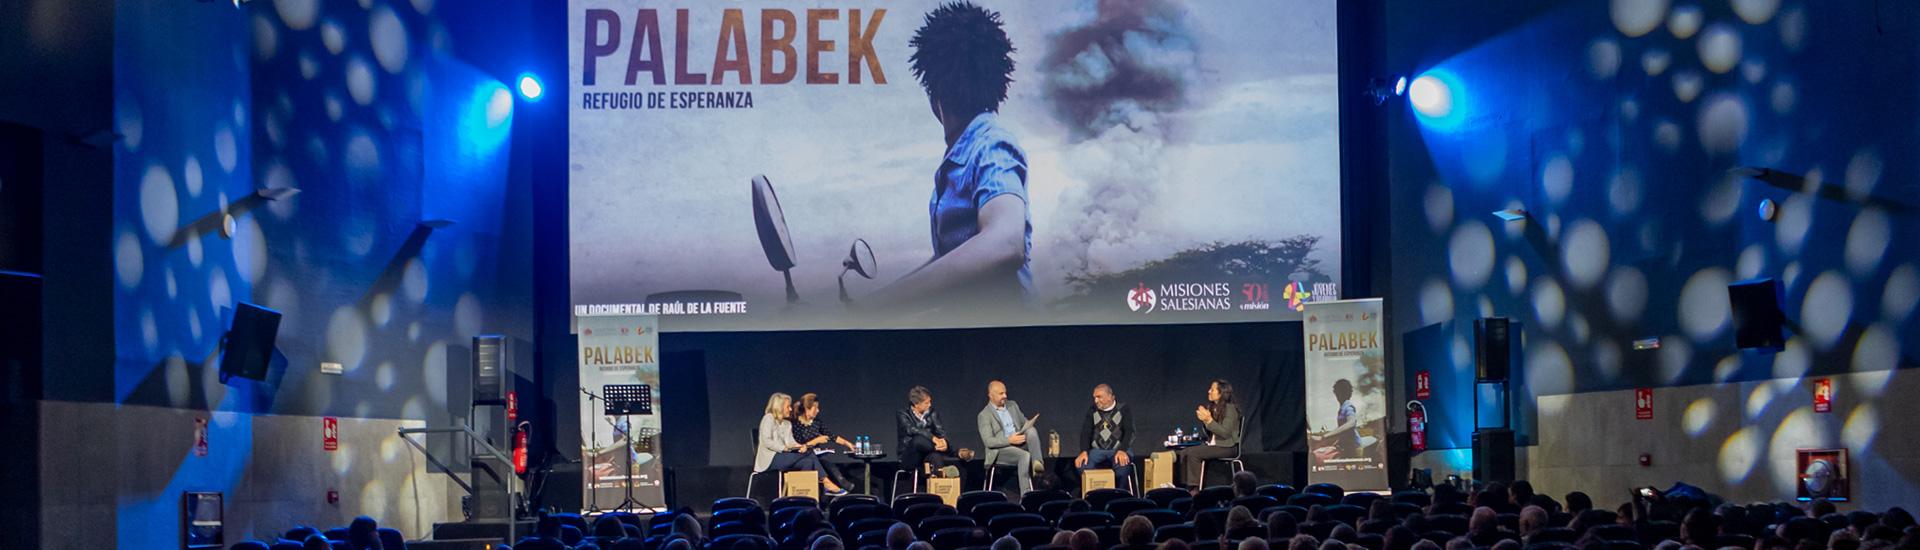 Palabek. Refugio de esperanza documental